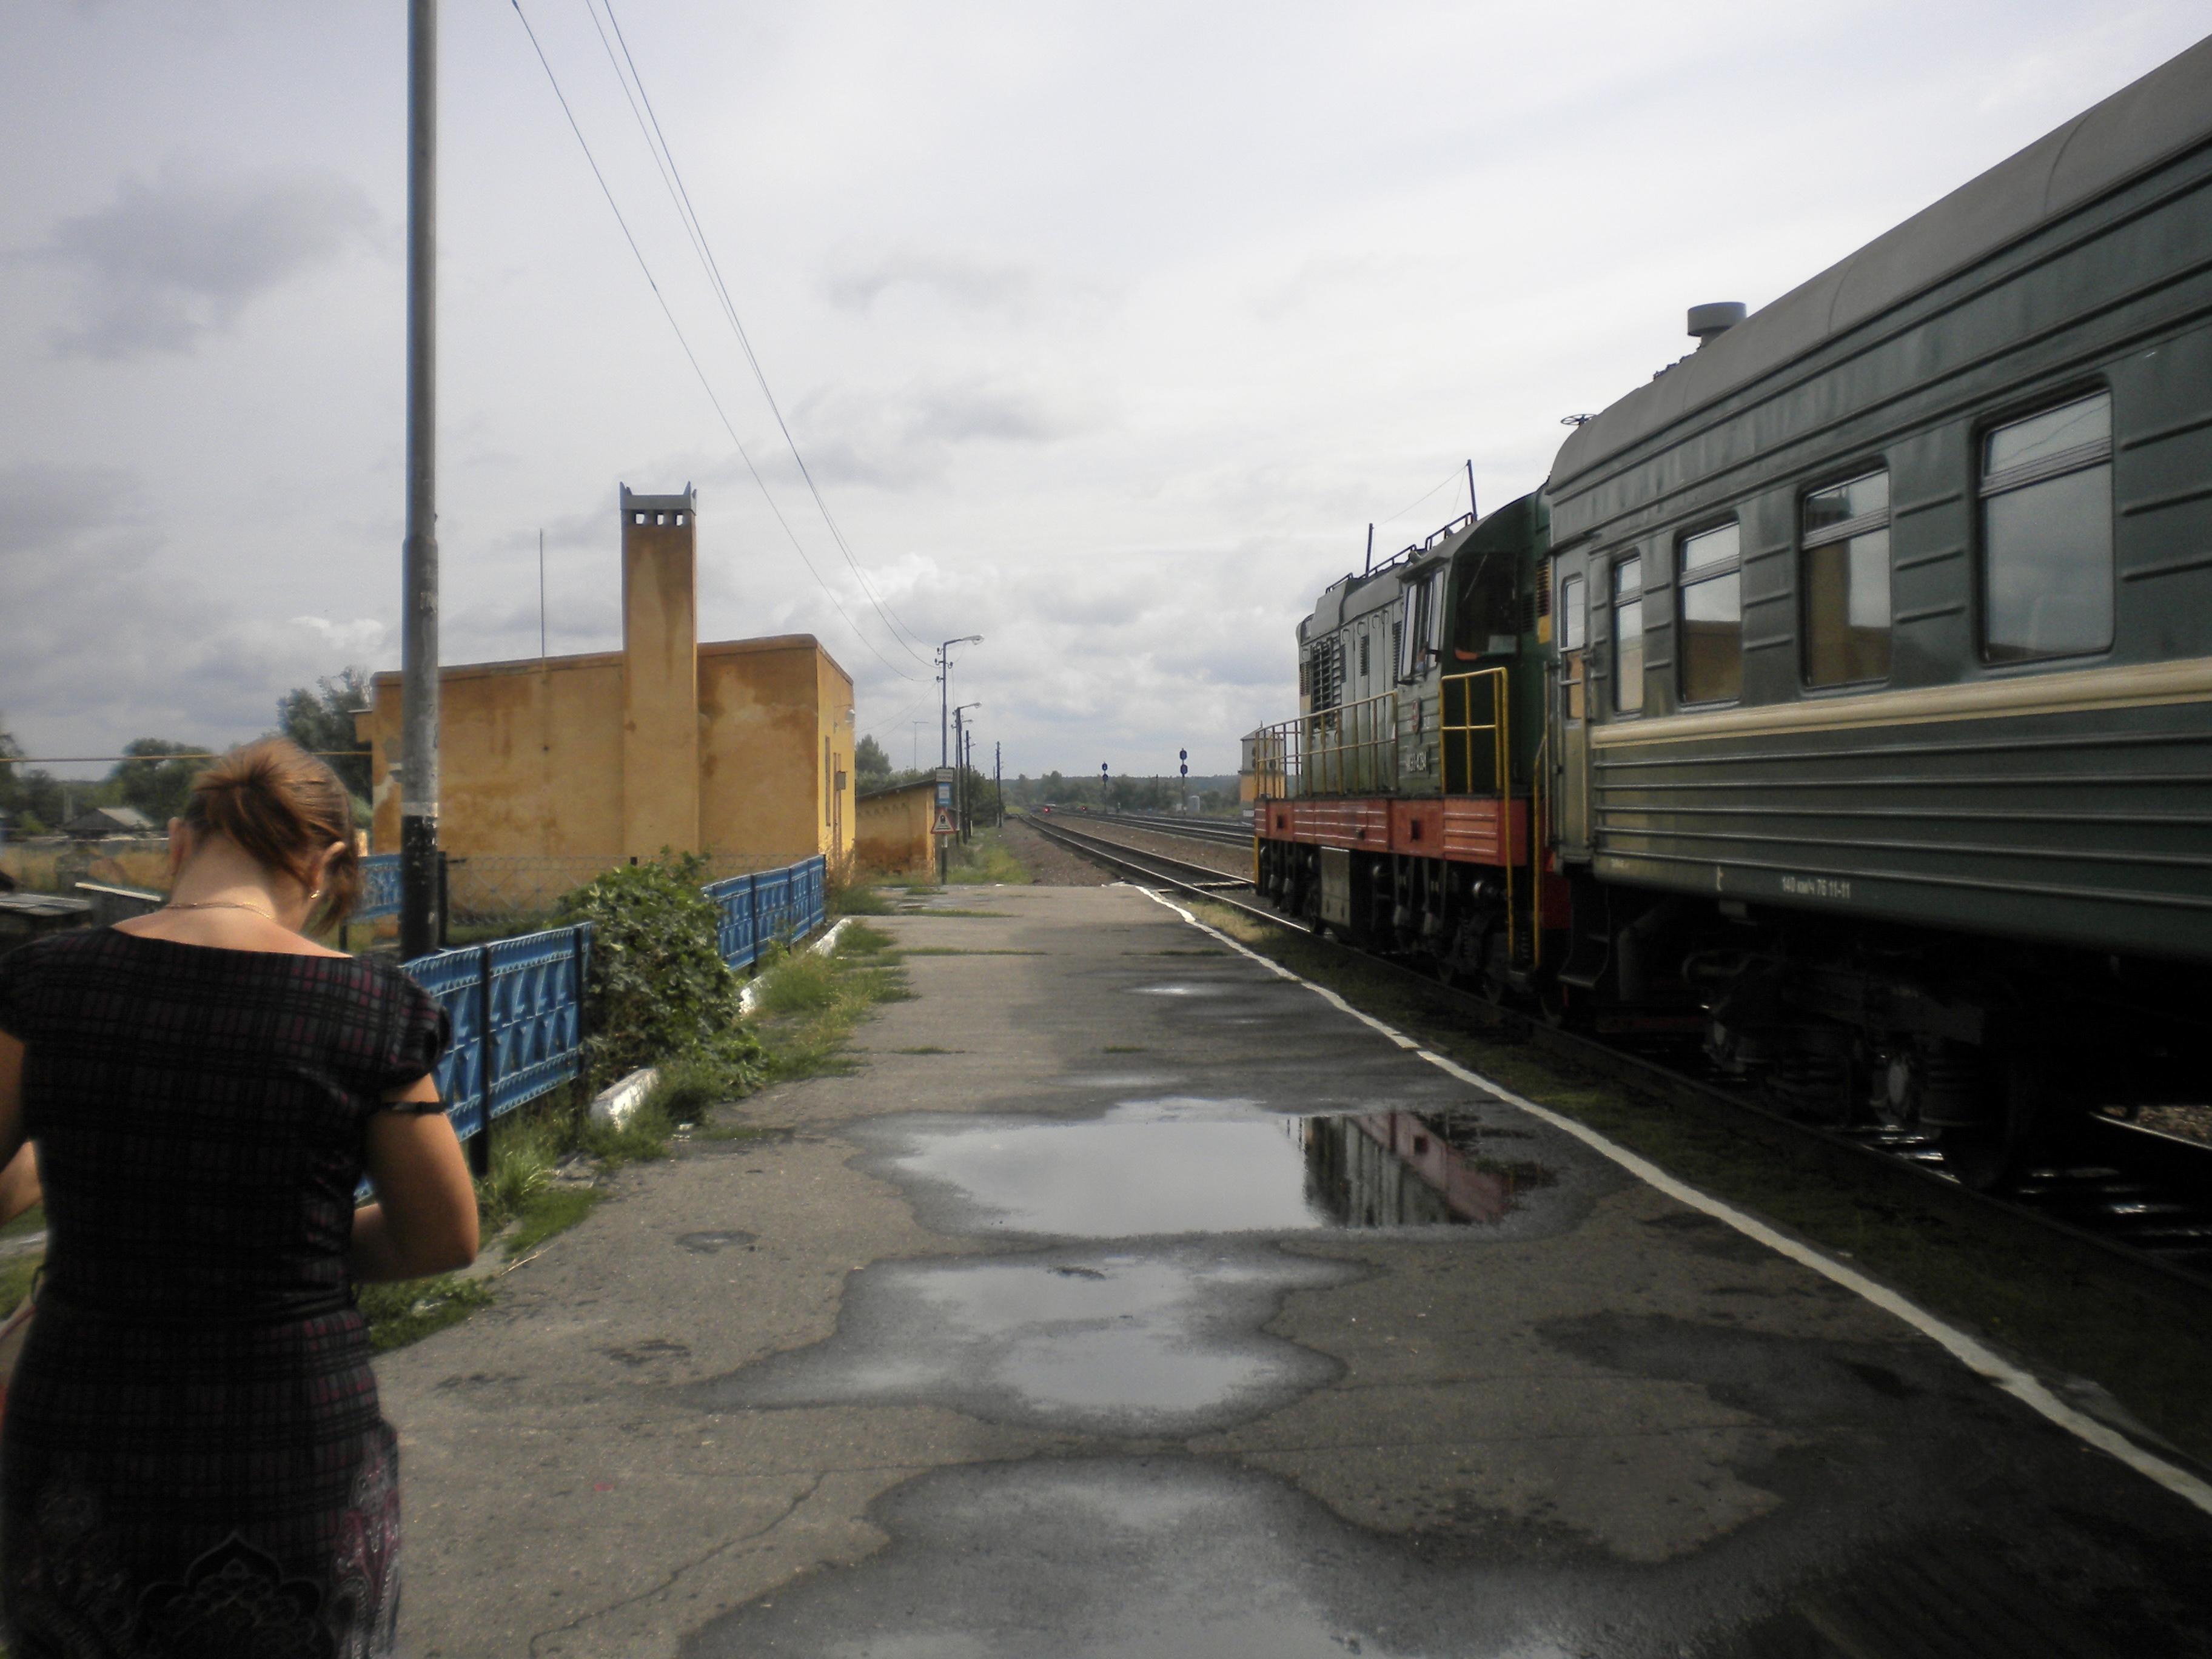 https://upload.wikimedia.org/wikipedia/commons/8/89/Vertunovskaya_10.JPG